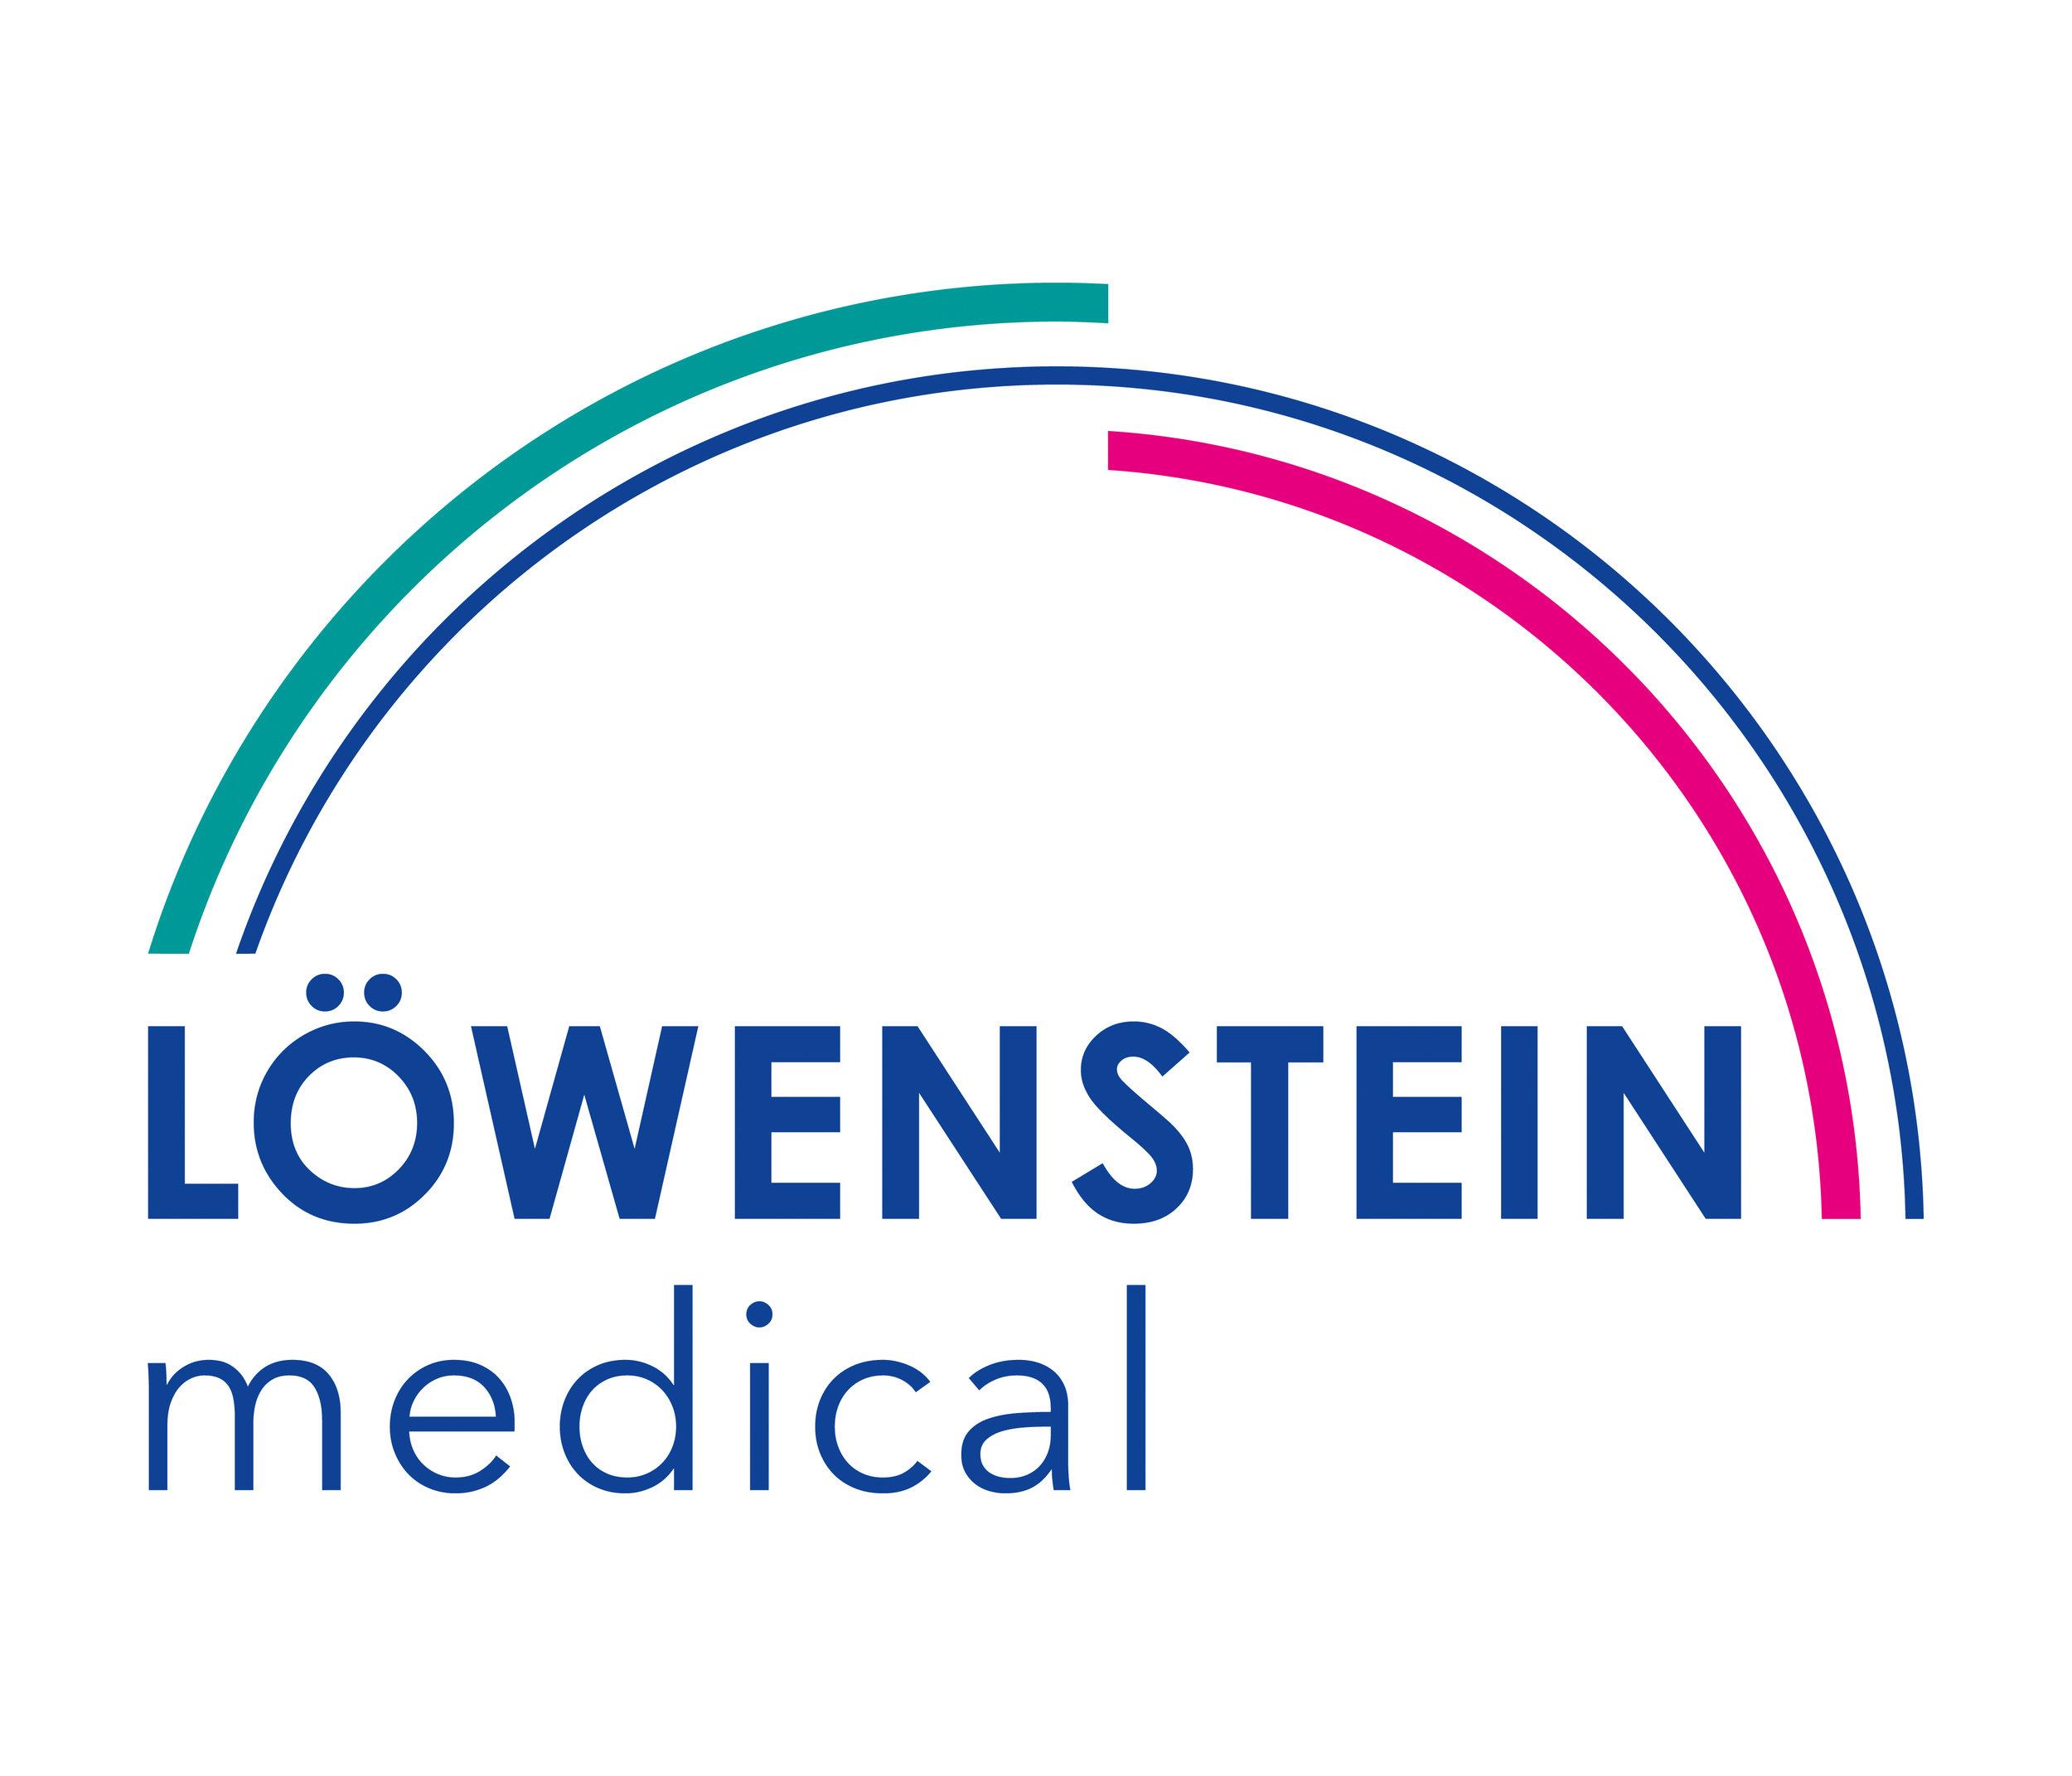 Lowenstein Medical.jpg